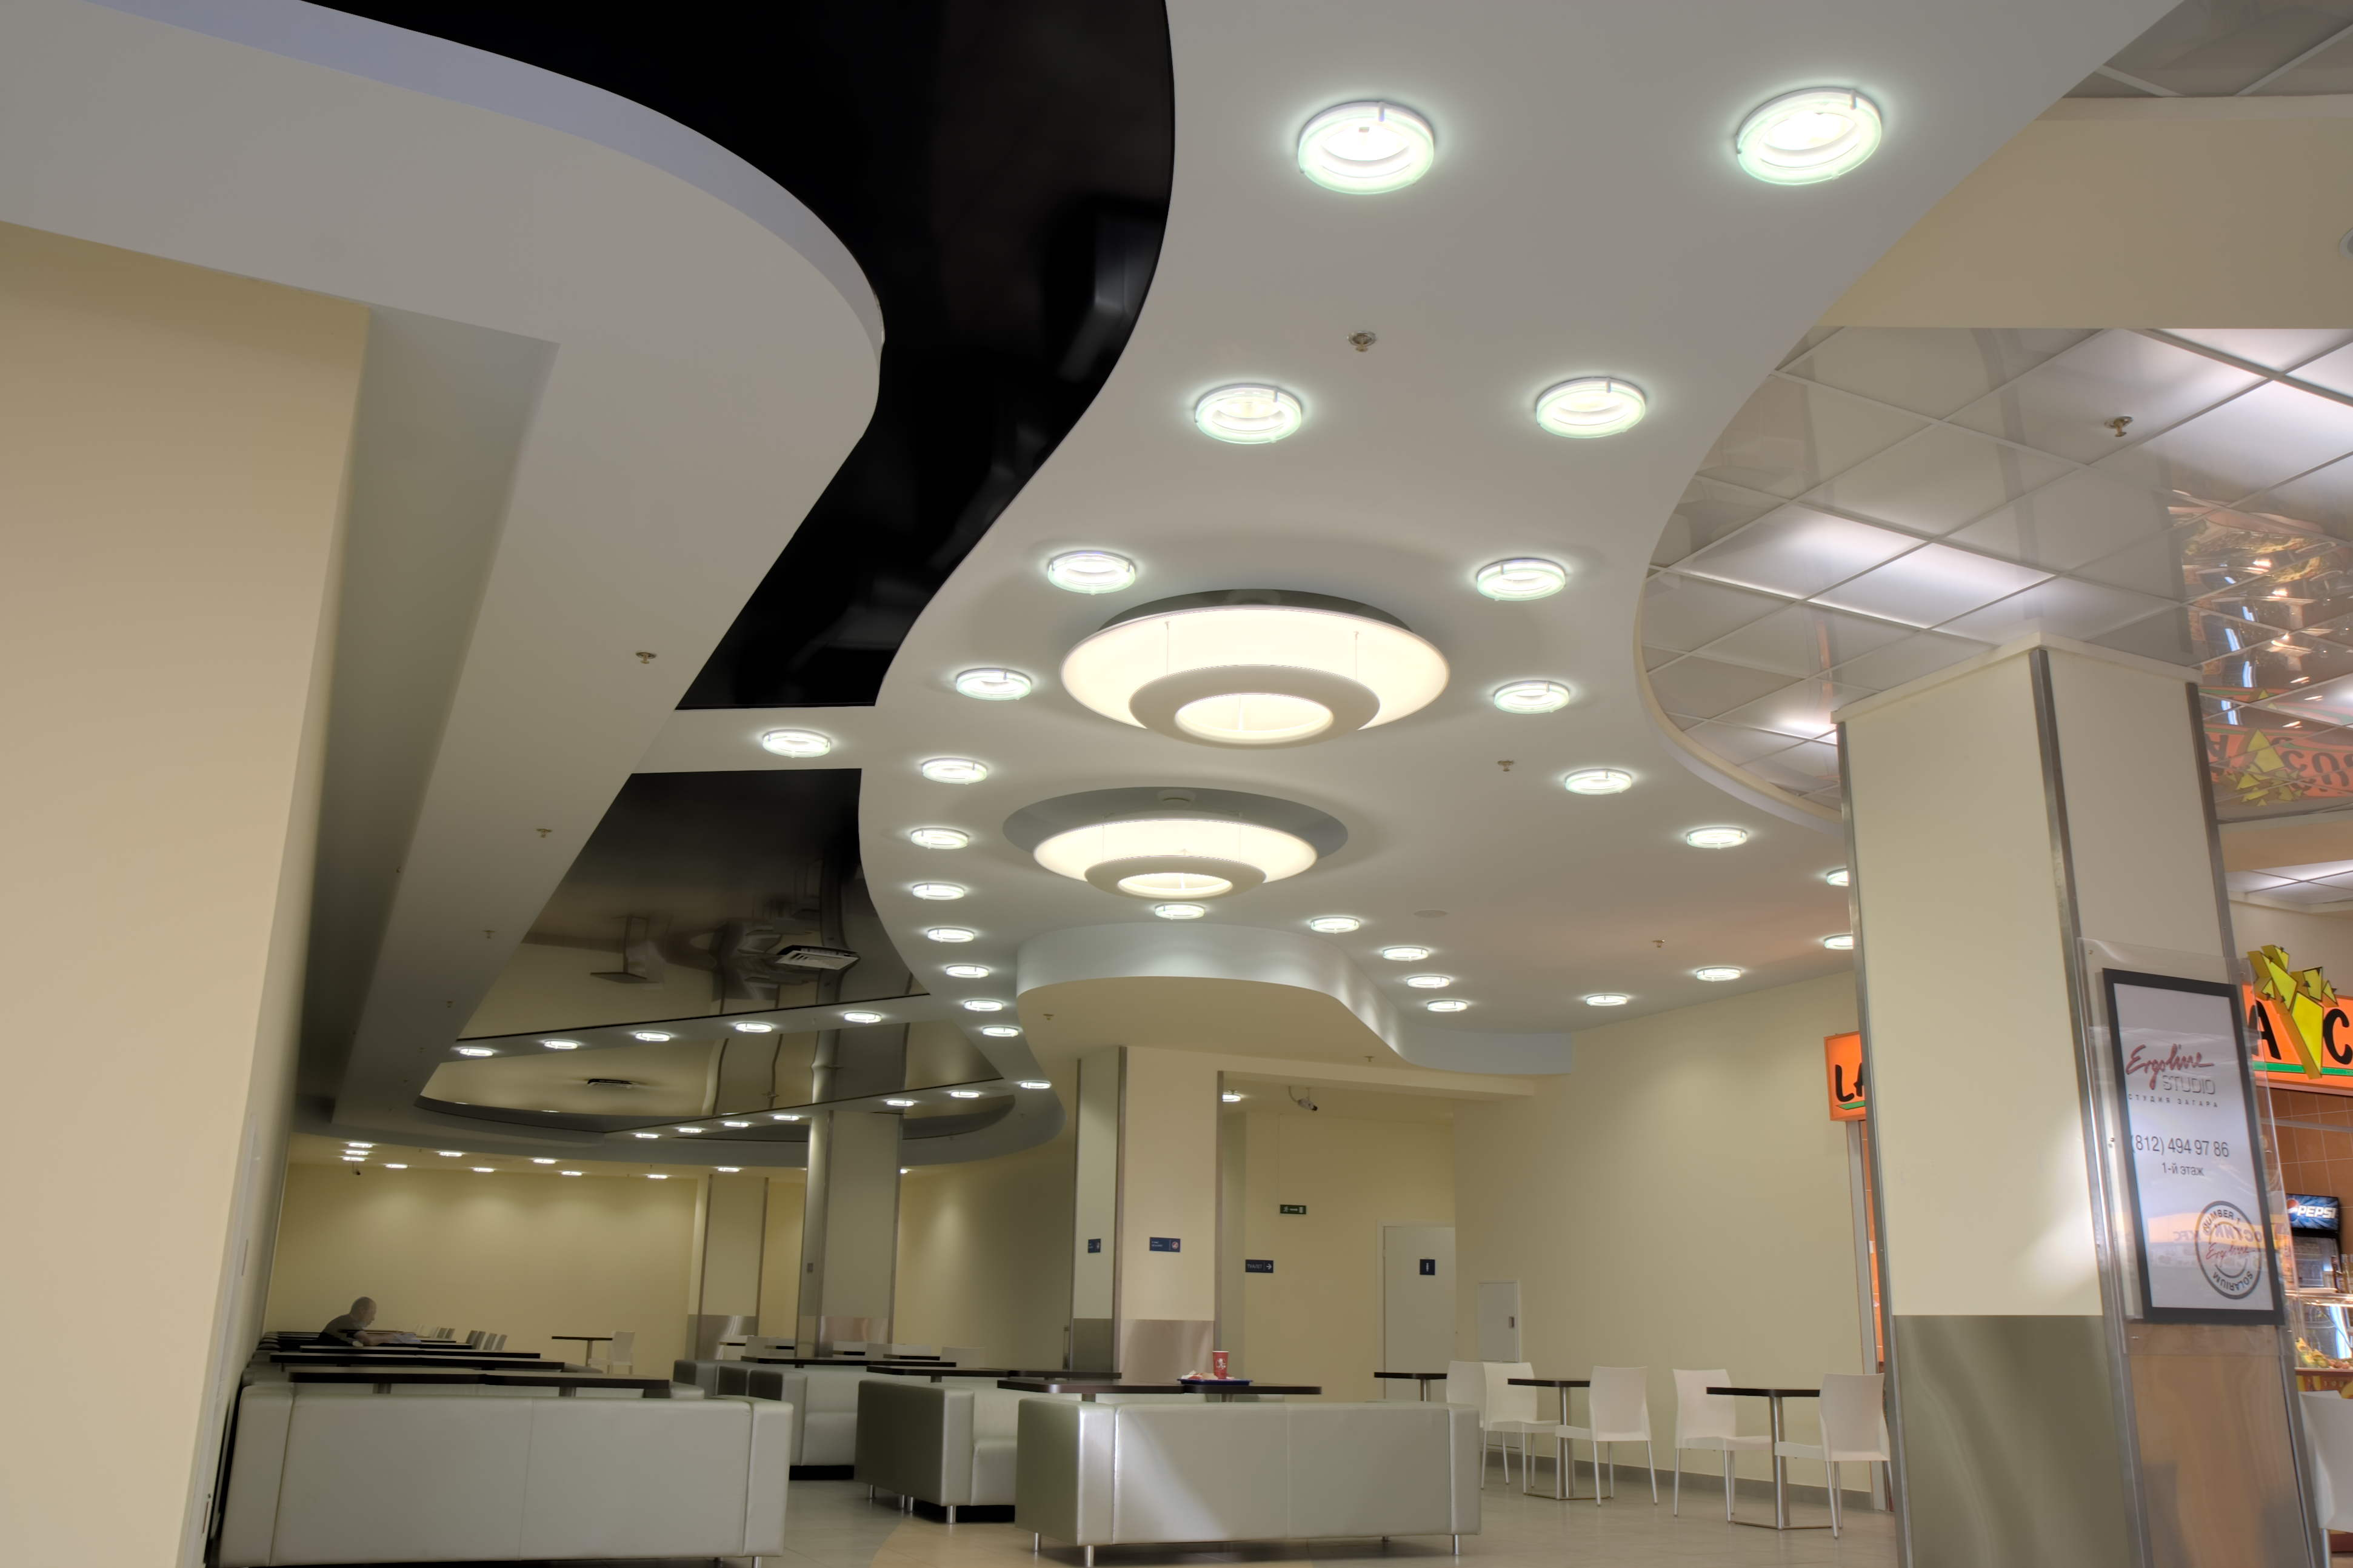 Dalle polystyrene de plafond nanterre prix devis peinture entreprise ptqbm - Renovation plafond dalle polystyrene ...